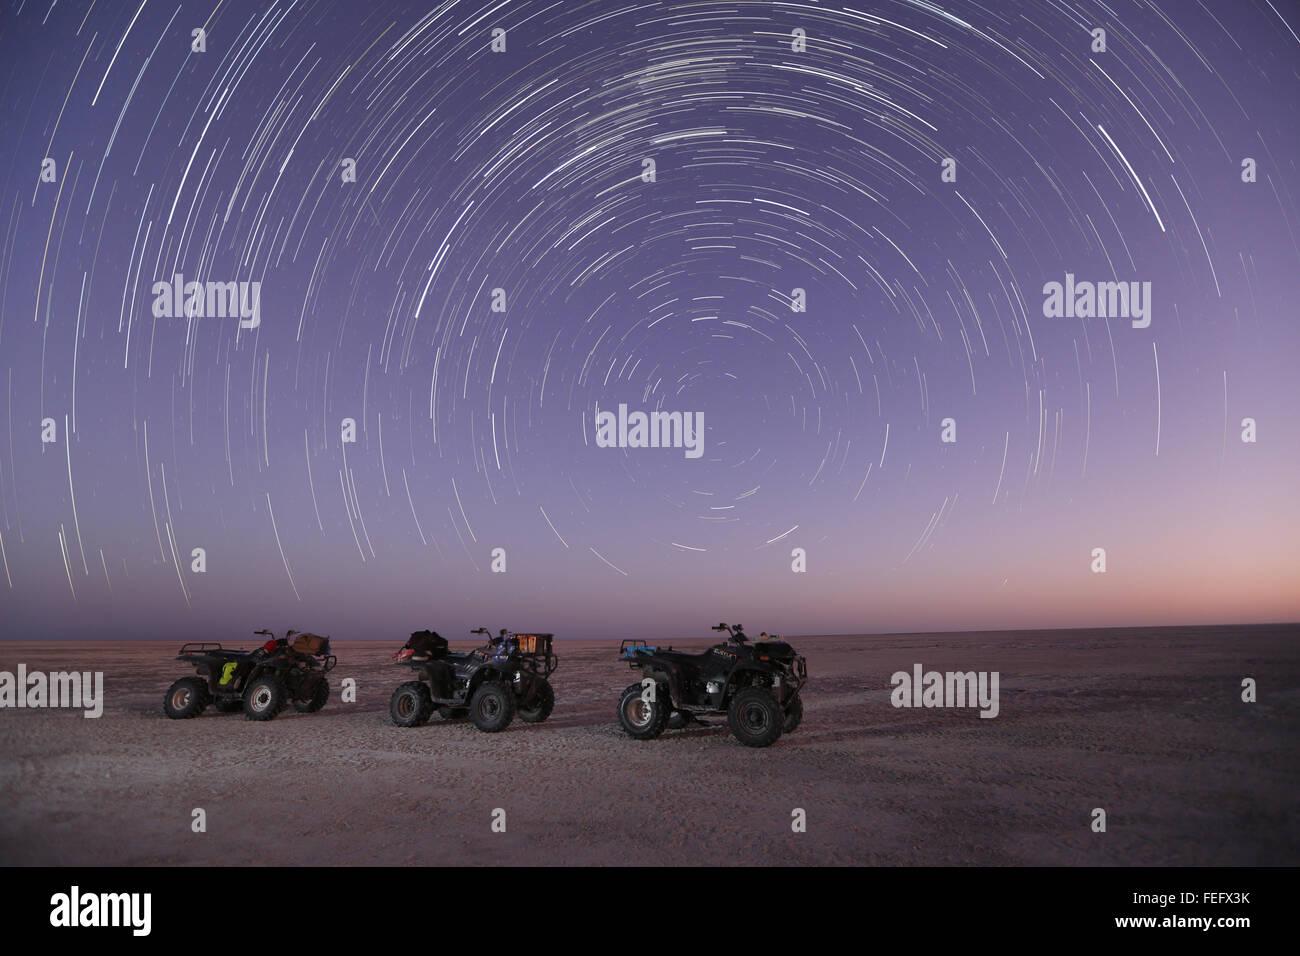 Quad bikes under a star trail. - Stock Image